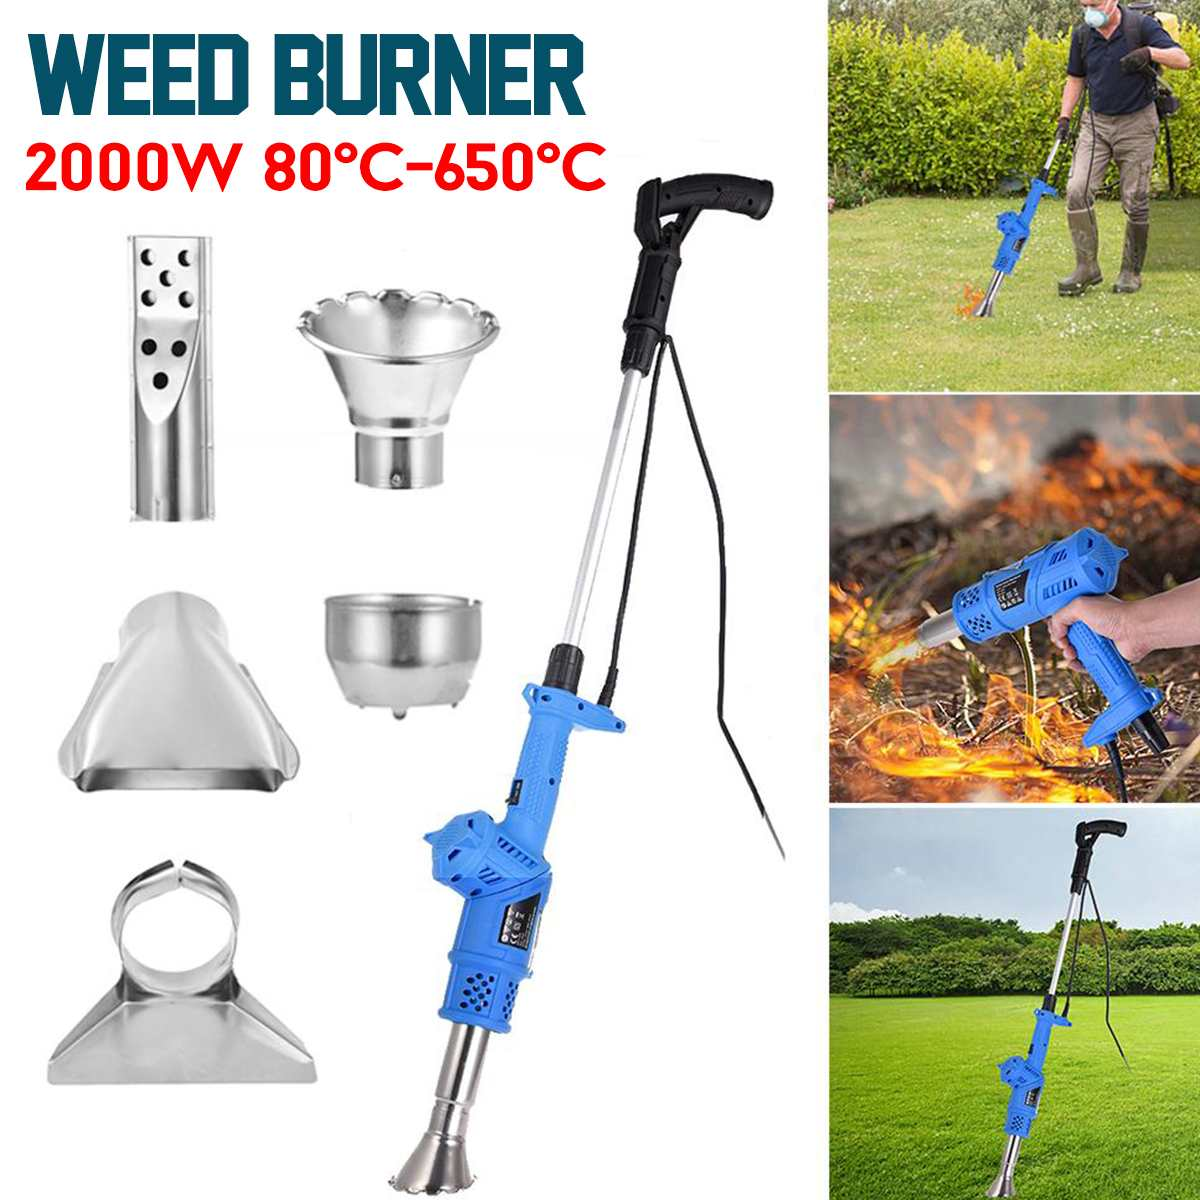 Electric Lawnmower Weeder 3-in-1 2000W Power Garden Tools Weeds Burner Professional Weeding High Efficiency Detachable Handle